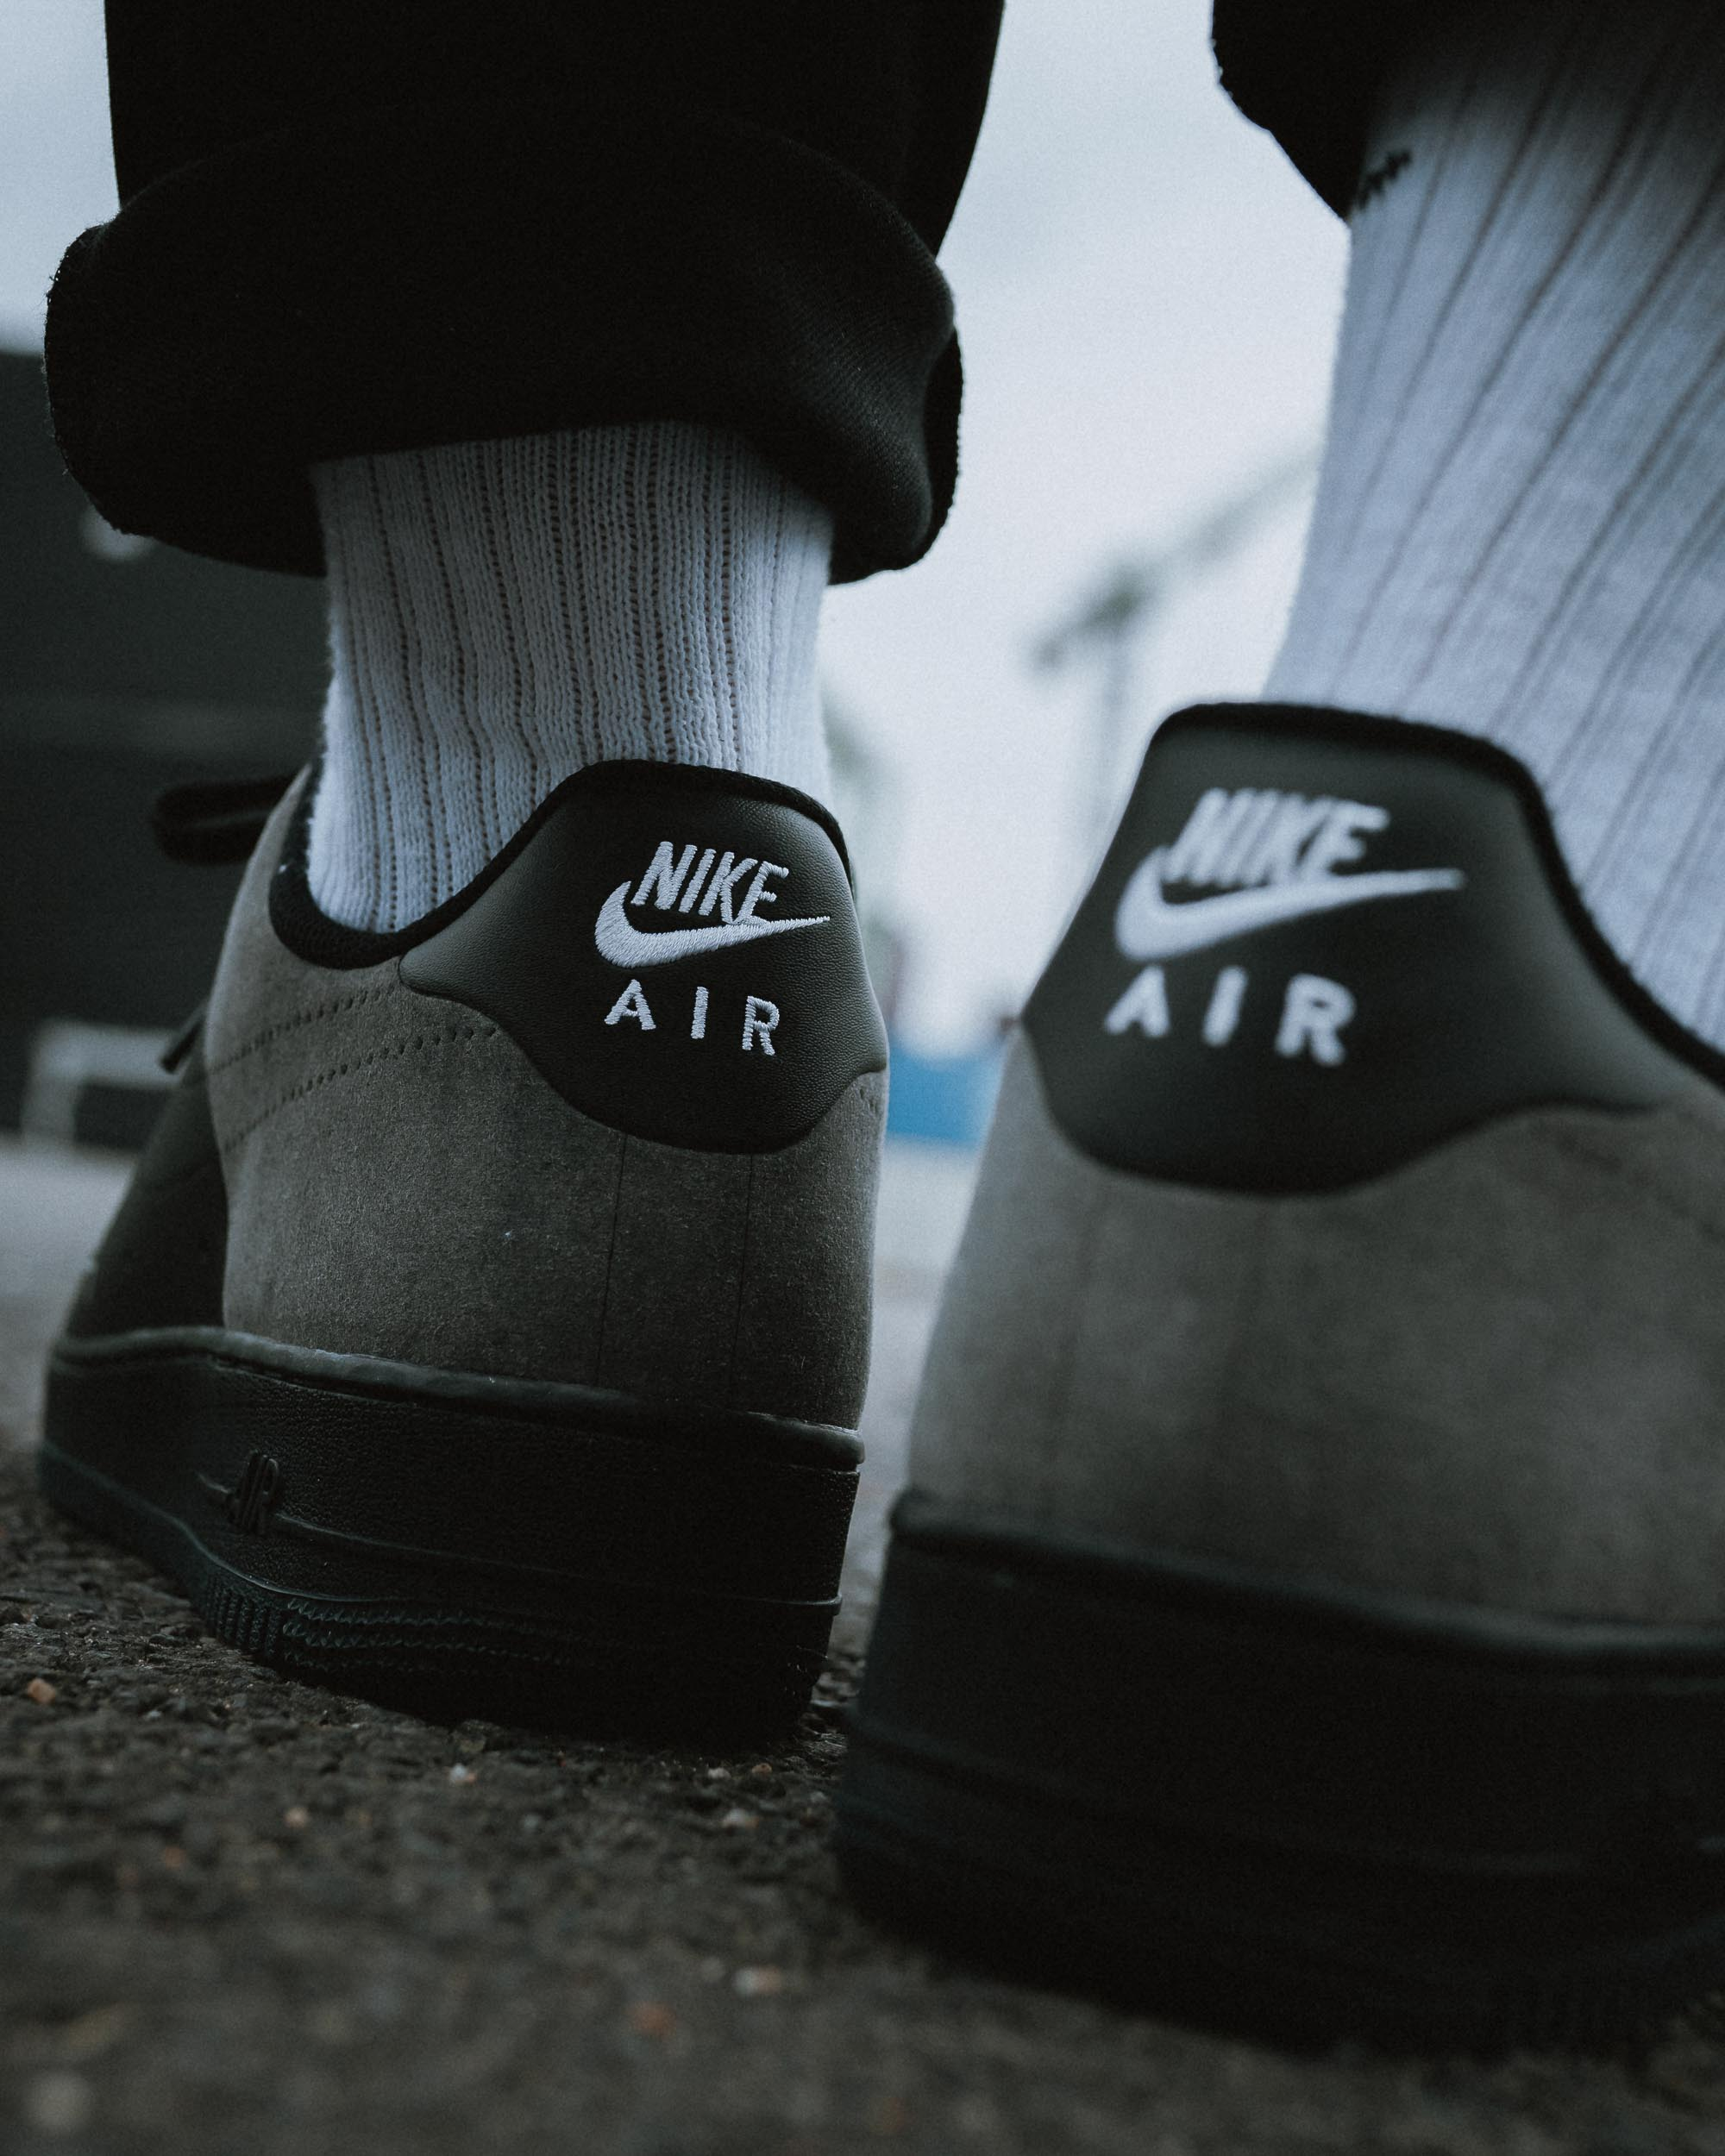 922d25dd5afa57 Nike x A-COLD-WALL  Air Force 1 - on feet